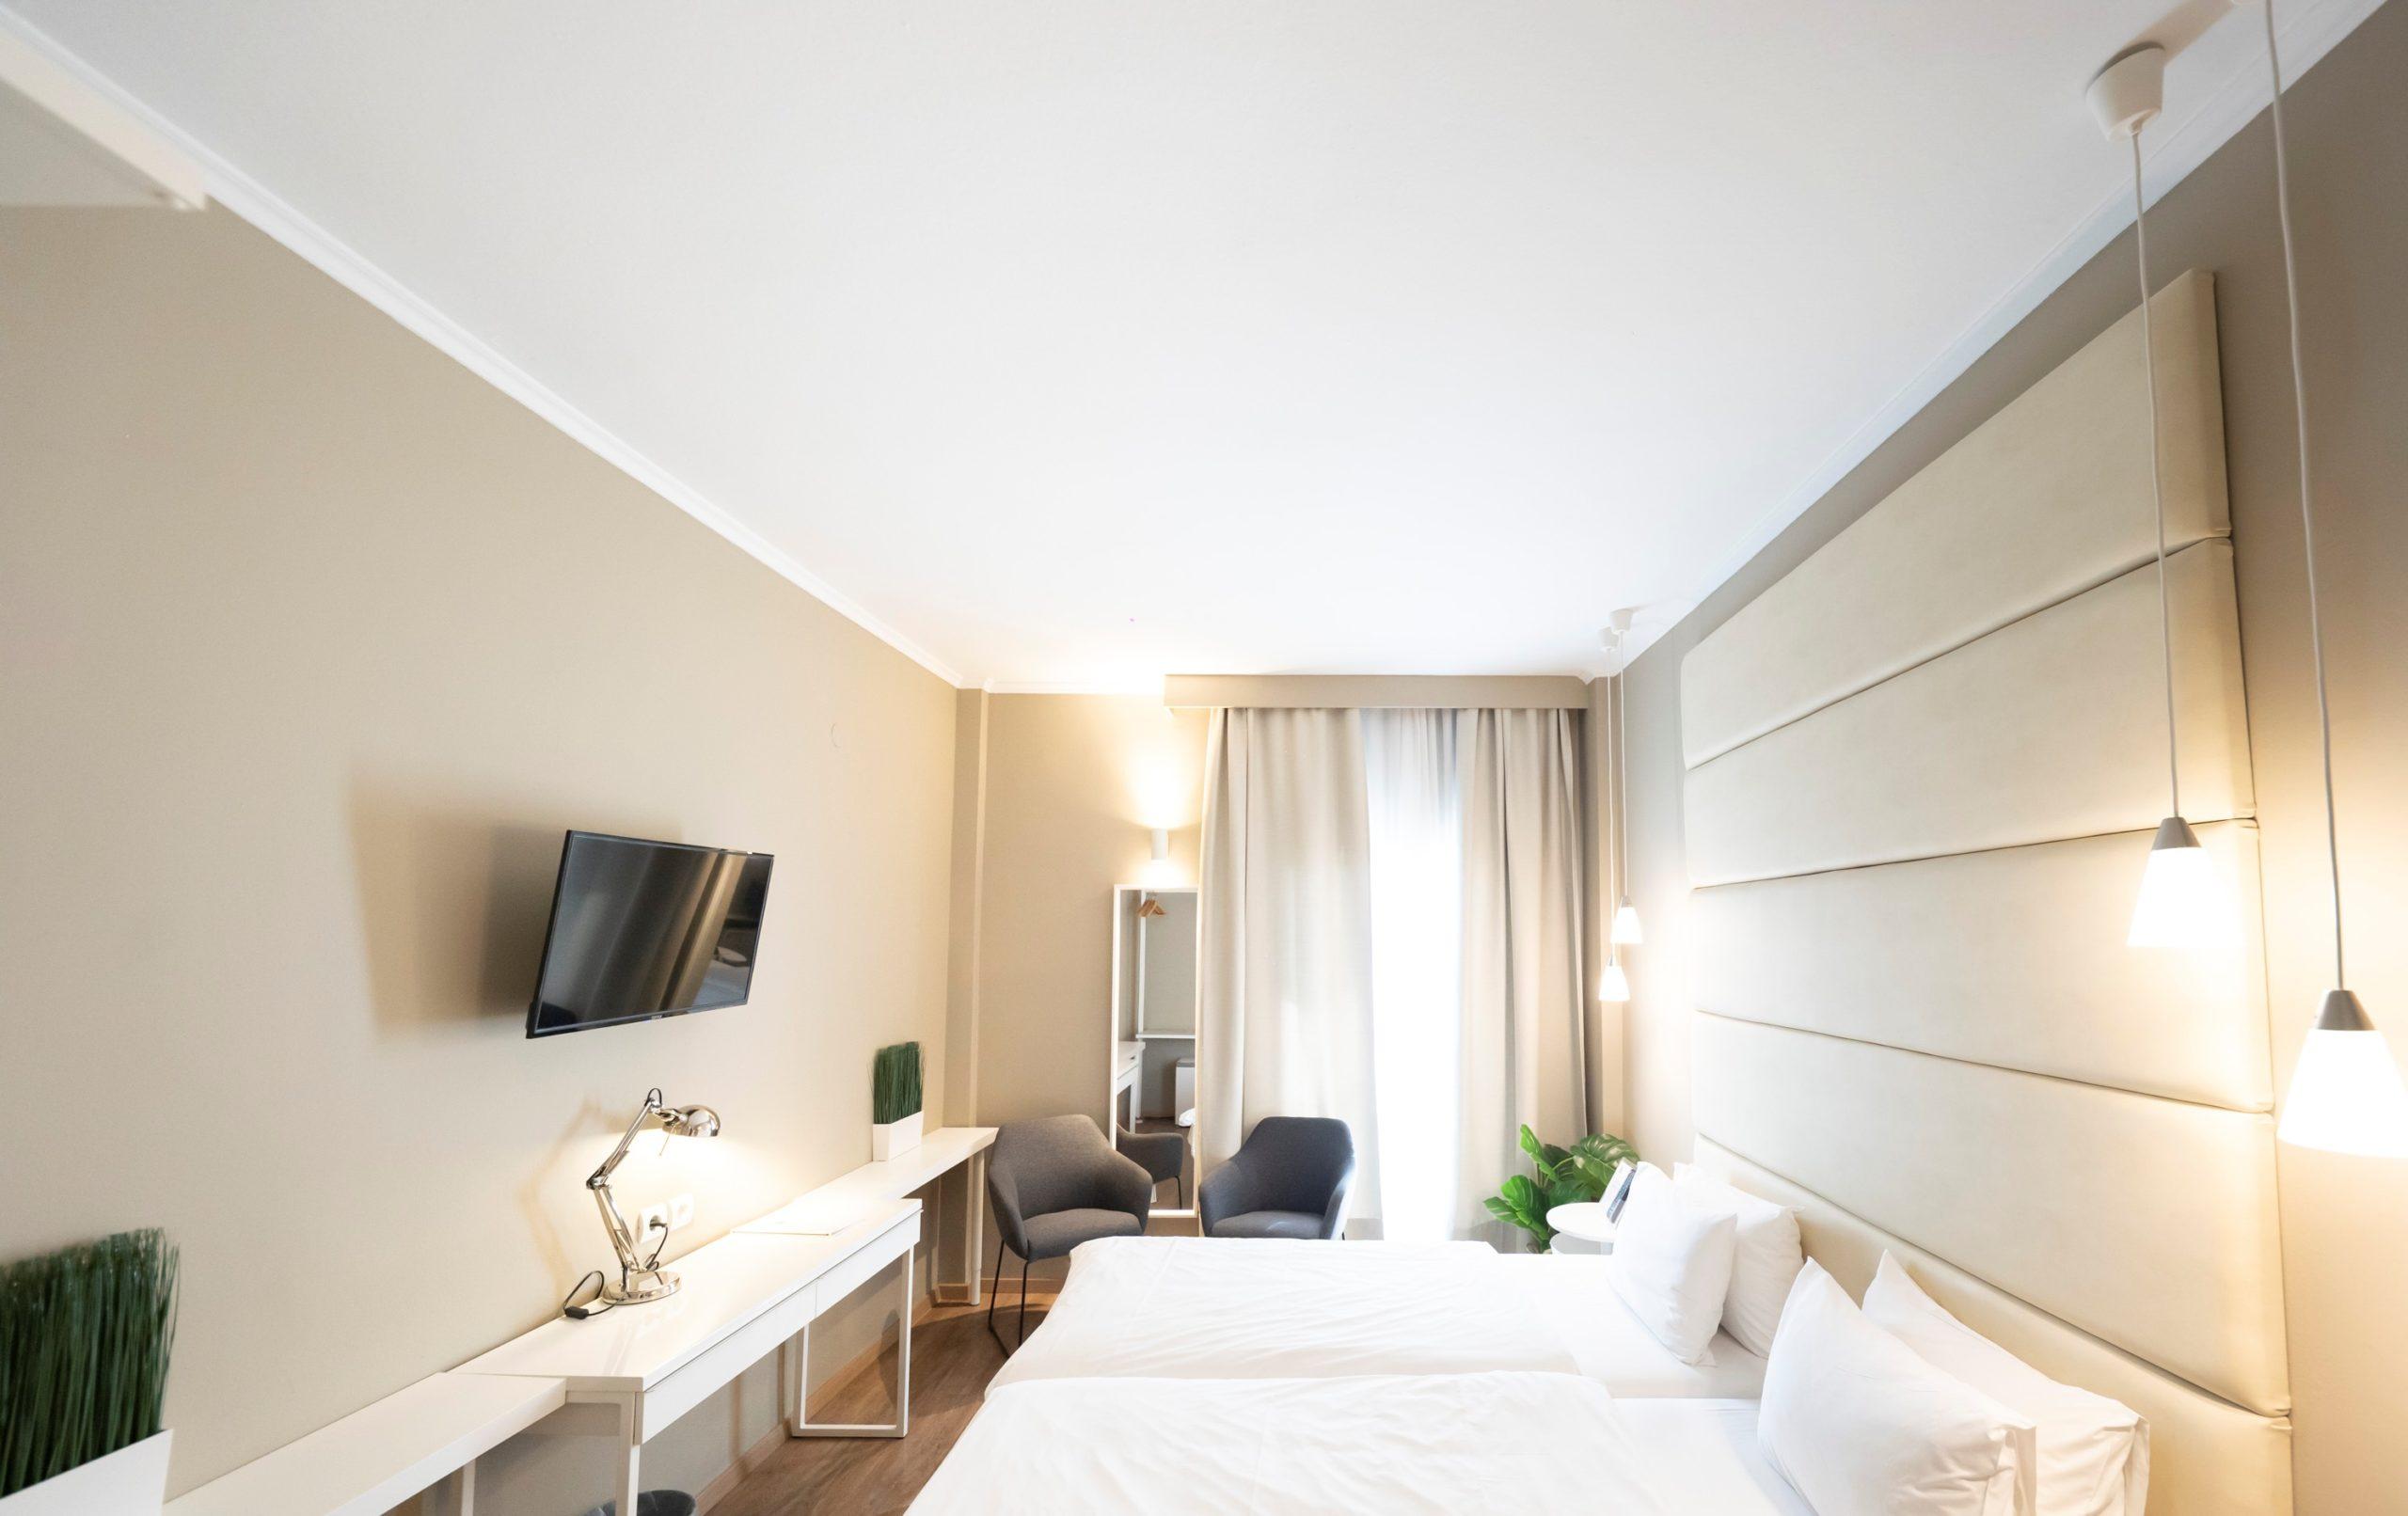 http://hotels%20in%20thessaloniki%20|%20abc%20Hotel%20|%20Thessaloniki%20Greece